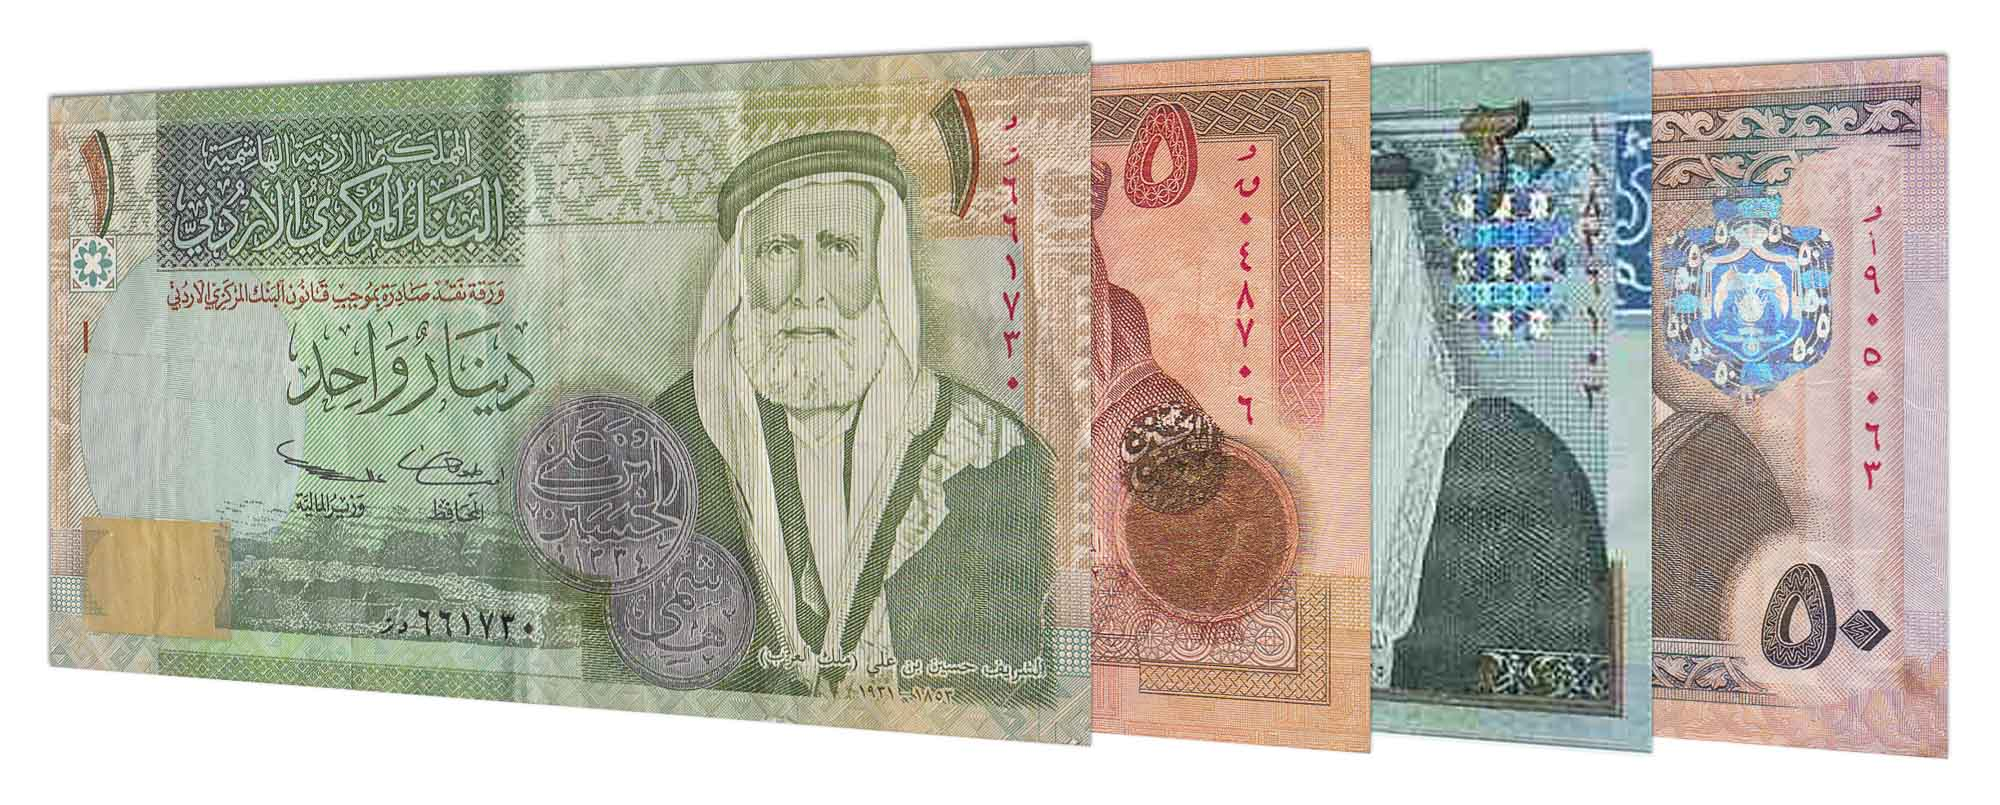 Jordanian Dinars Online Jod Home